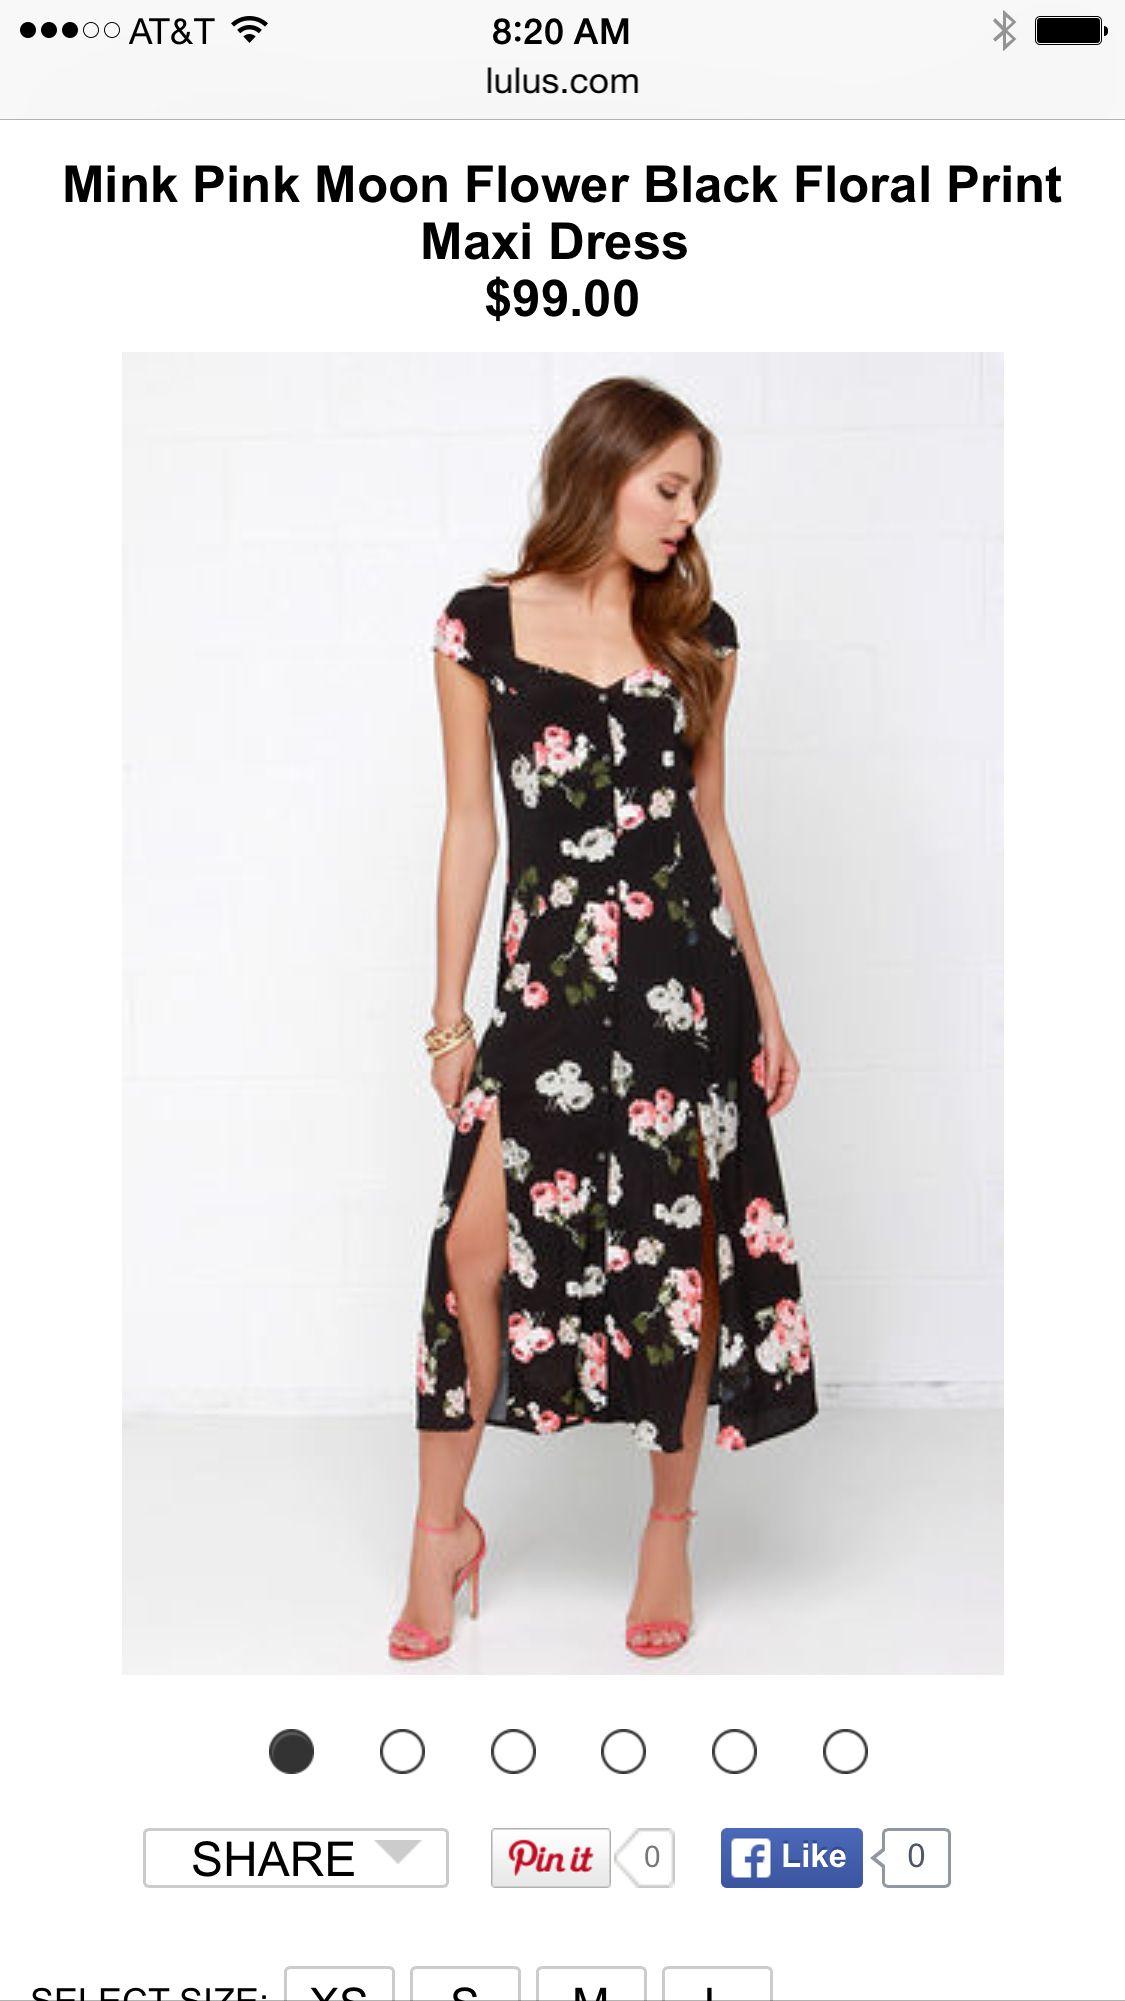 acae9d3caeeb9 Floral dress | Get In My Closet!!!! | Floral print maxi dress, Pink ...